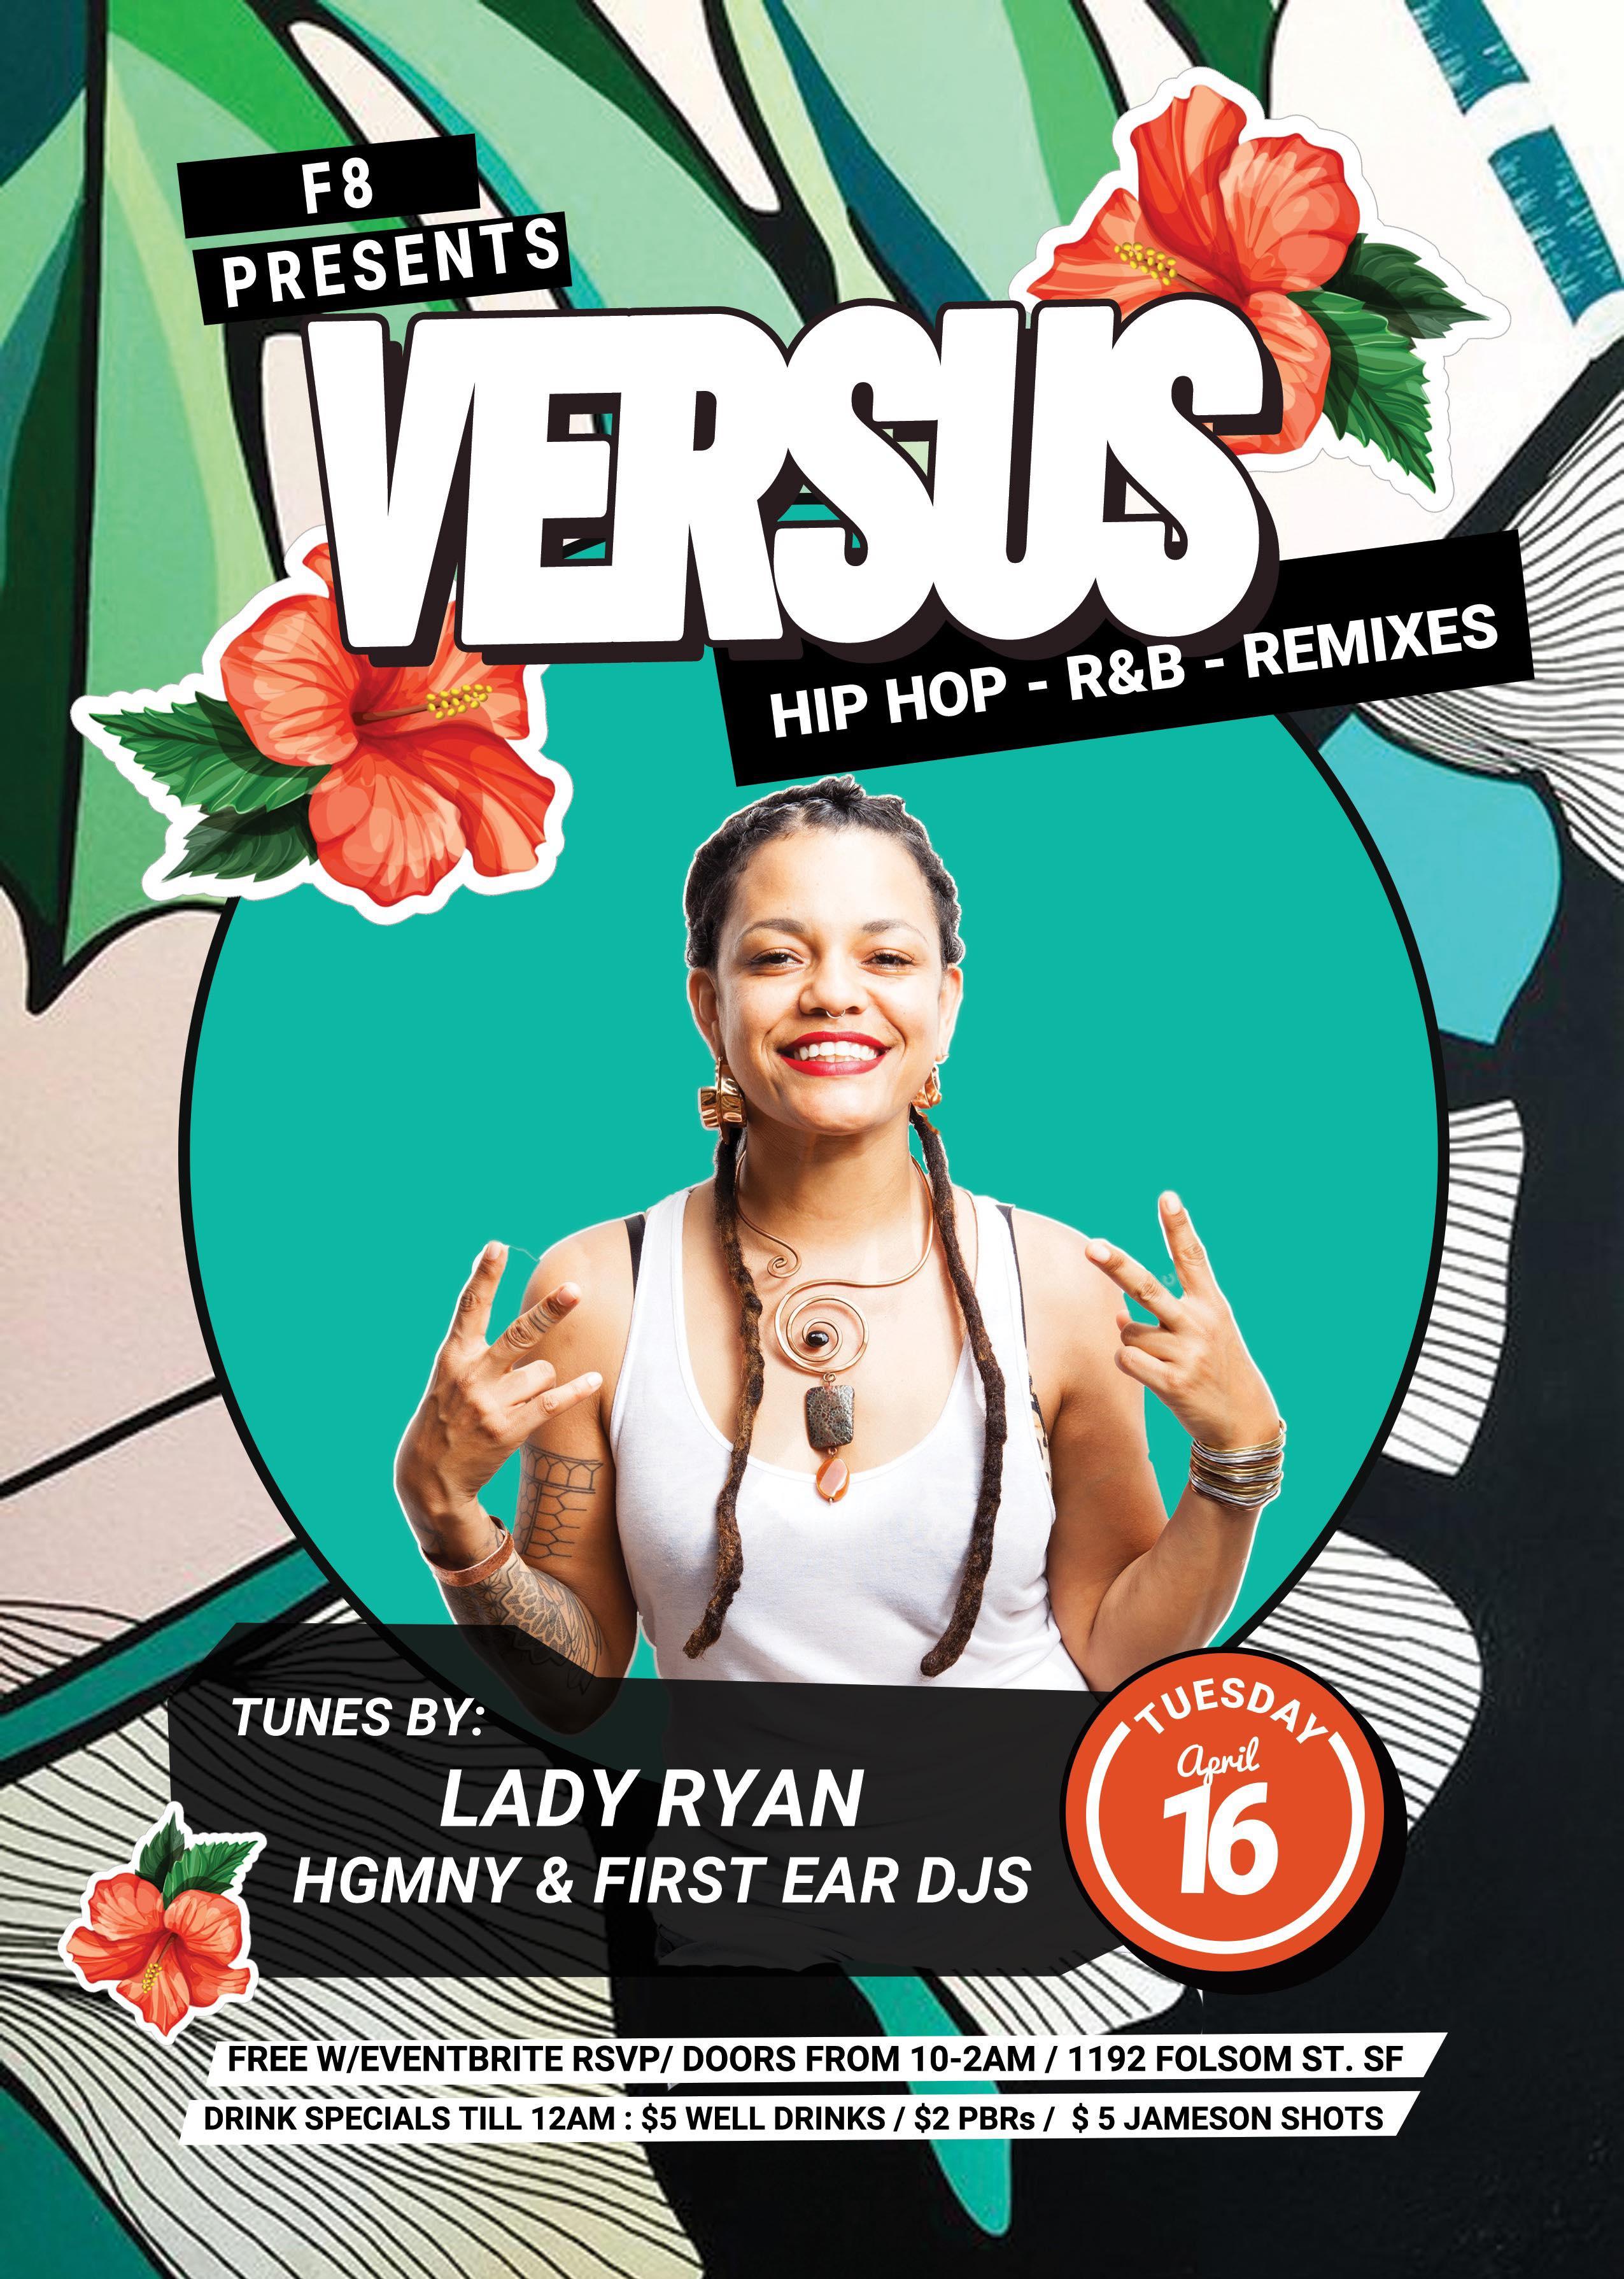 Versus Free Hip Hop & RnB ft  Lady Ryan at F8 | 1192 Folsom